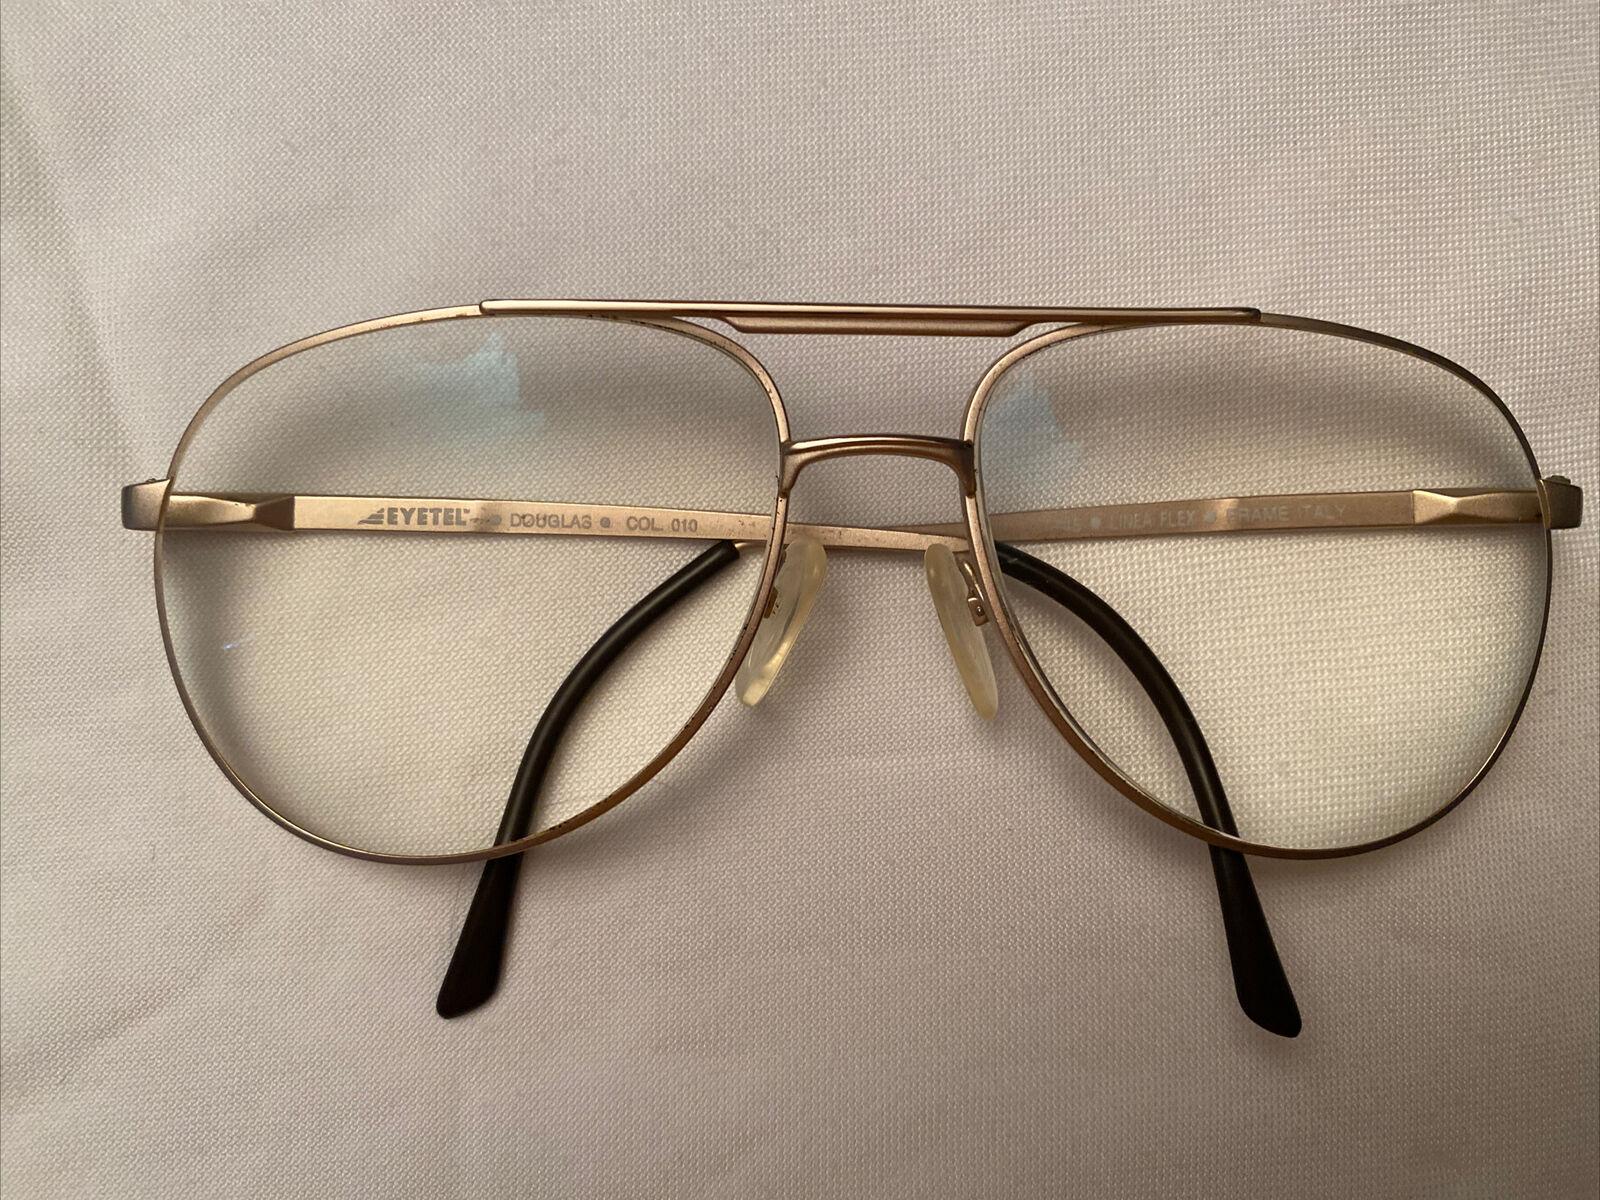 EYETEL VINTAGE DOUGLAS ITALY 1980's RX GLASSES FRAMES w/ ST THOMAS CASE AVIATOR